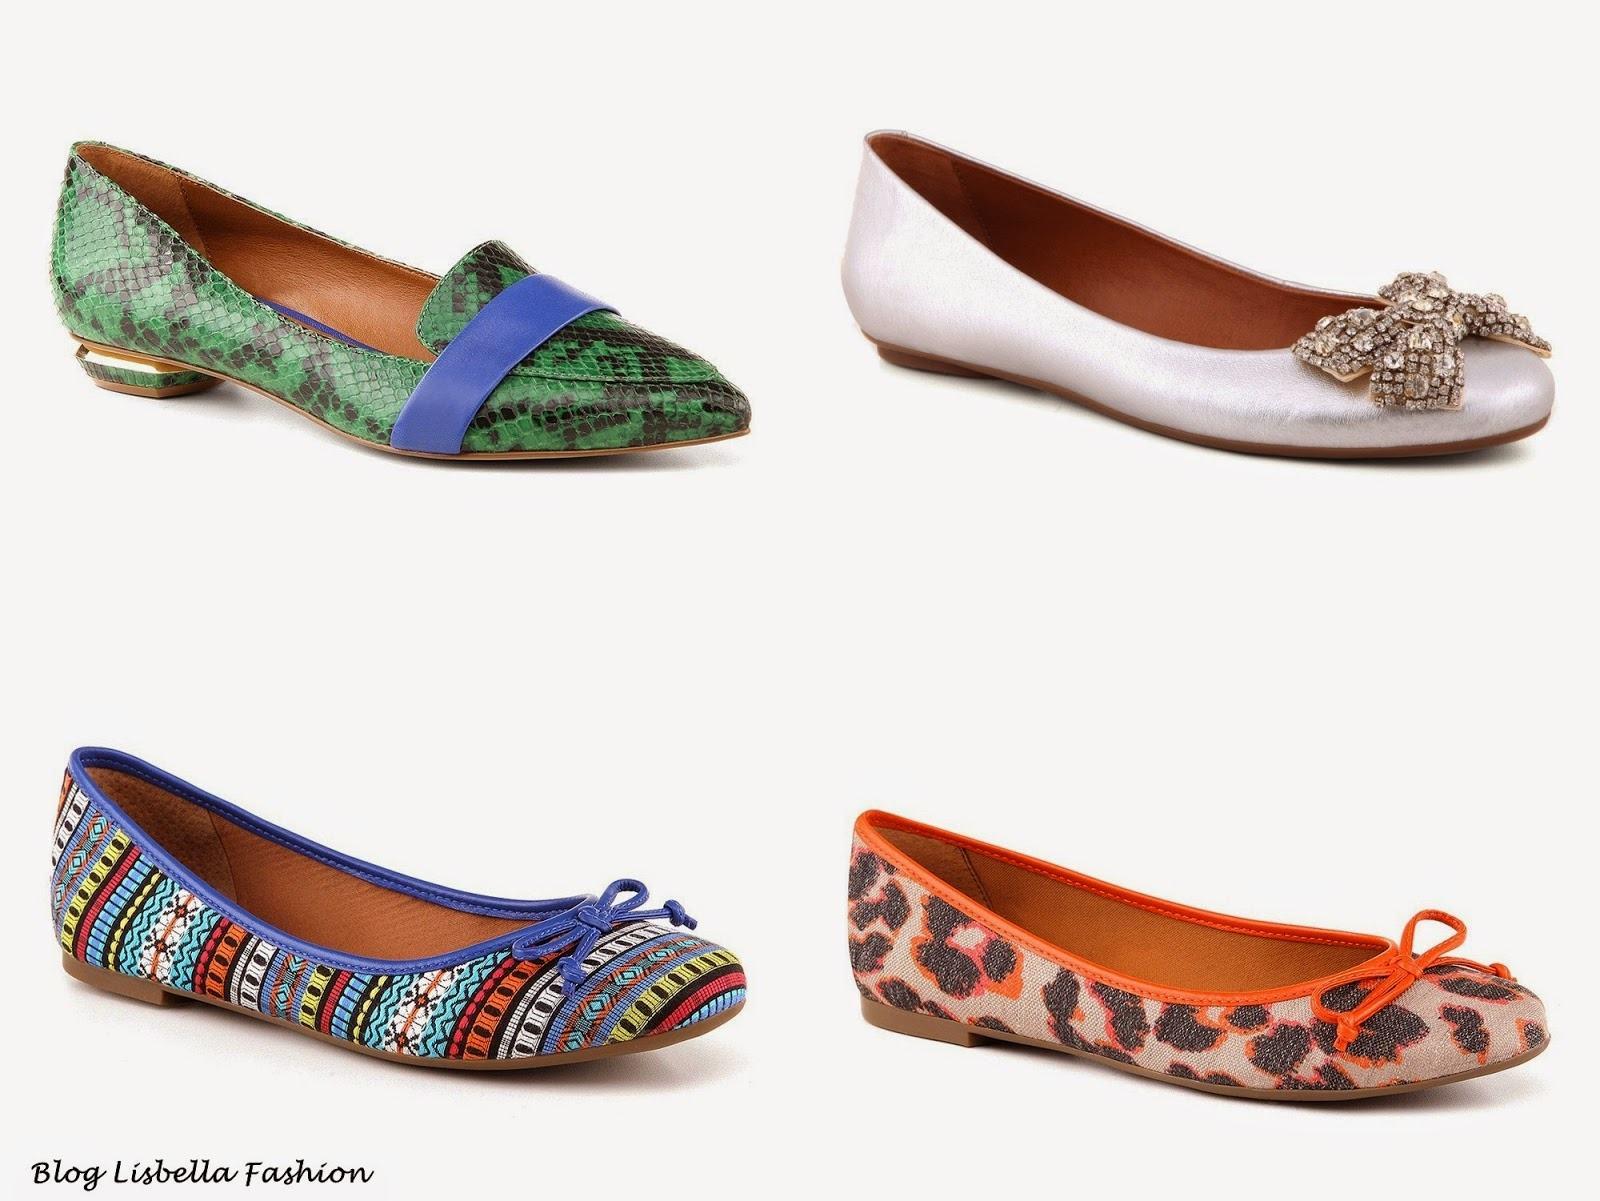 d16fa0d6c Sapatilhas femininas Arezzo modelos e cores